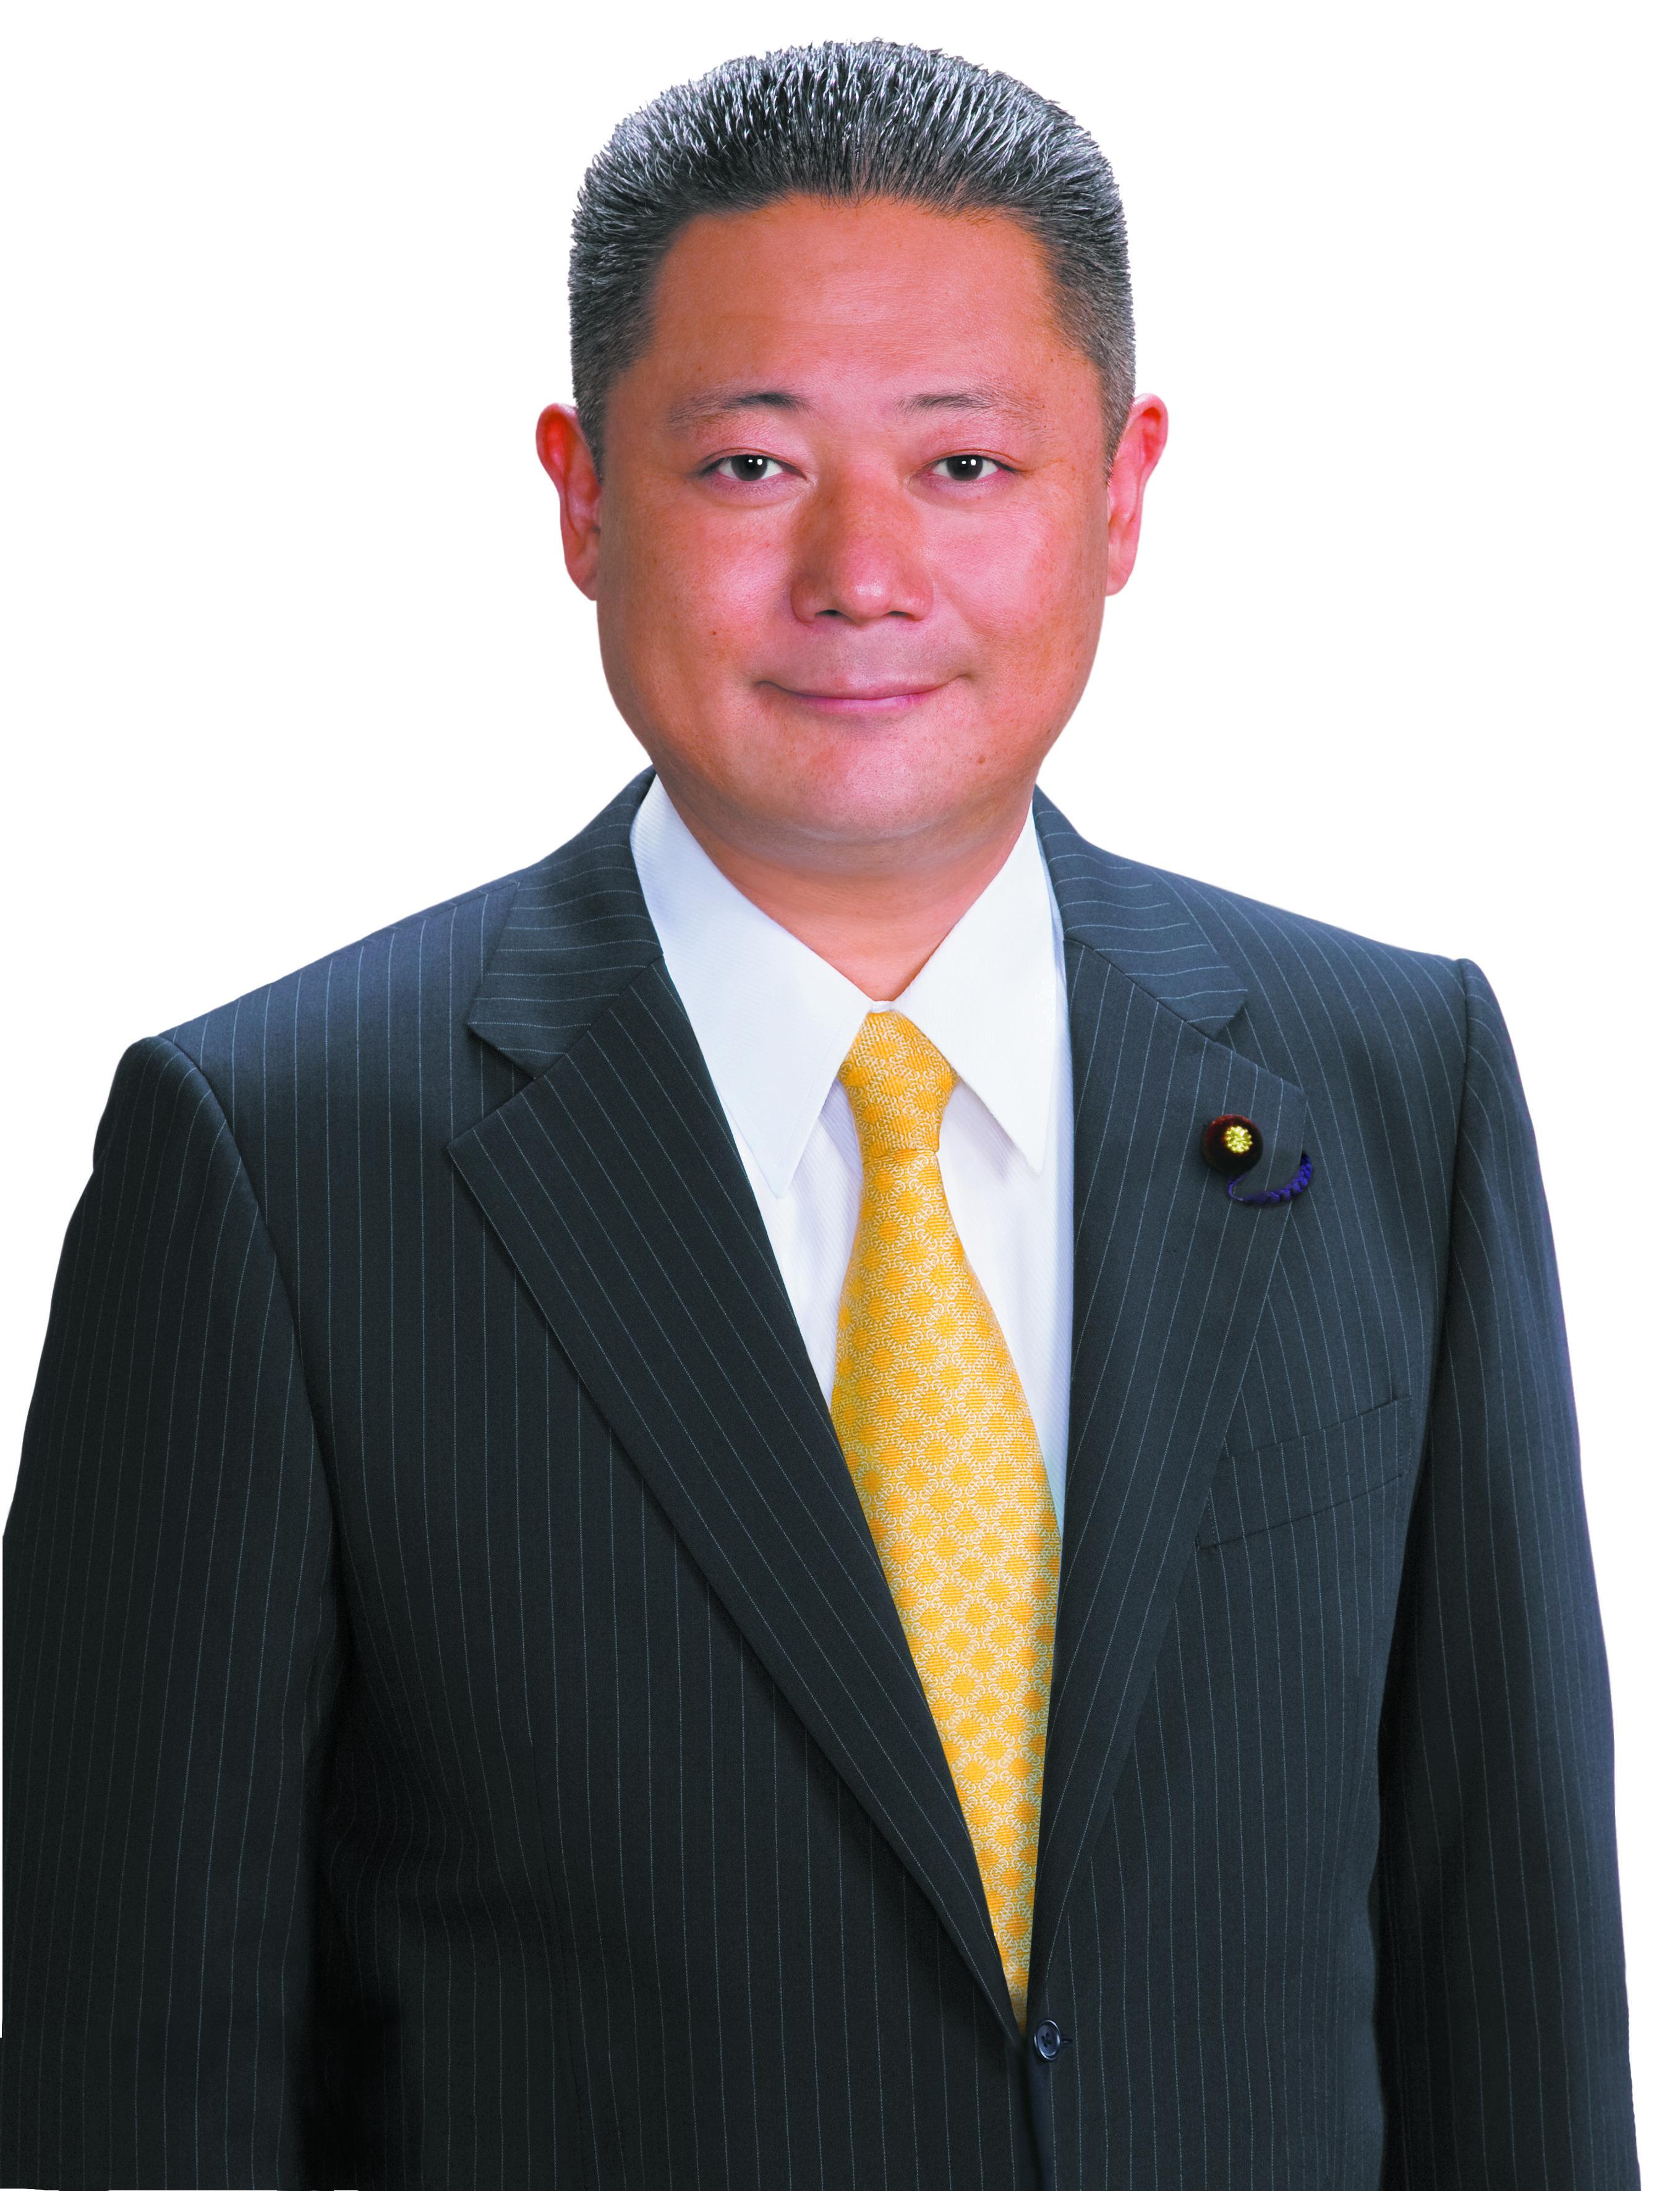 BS日テレ「深層NEWS」 馬場伸幸幹事長 生出演のお知らせ